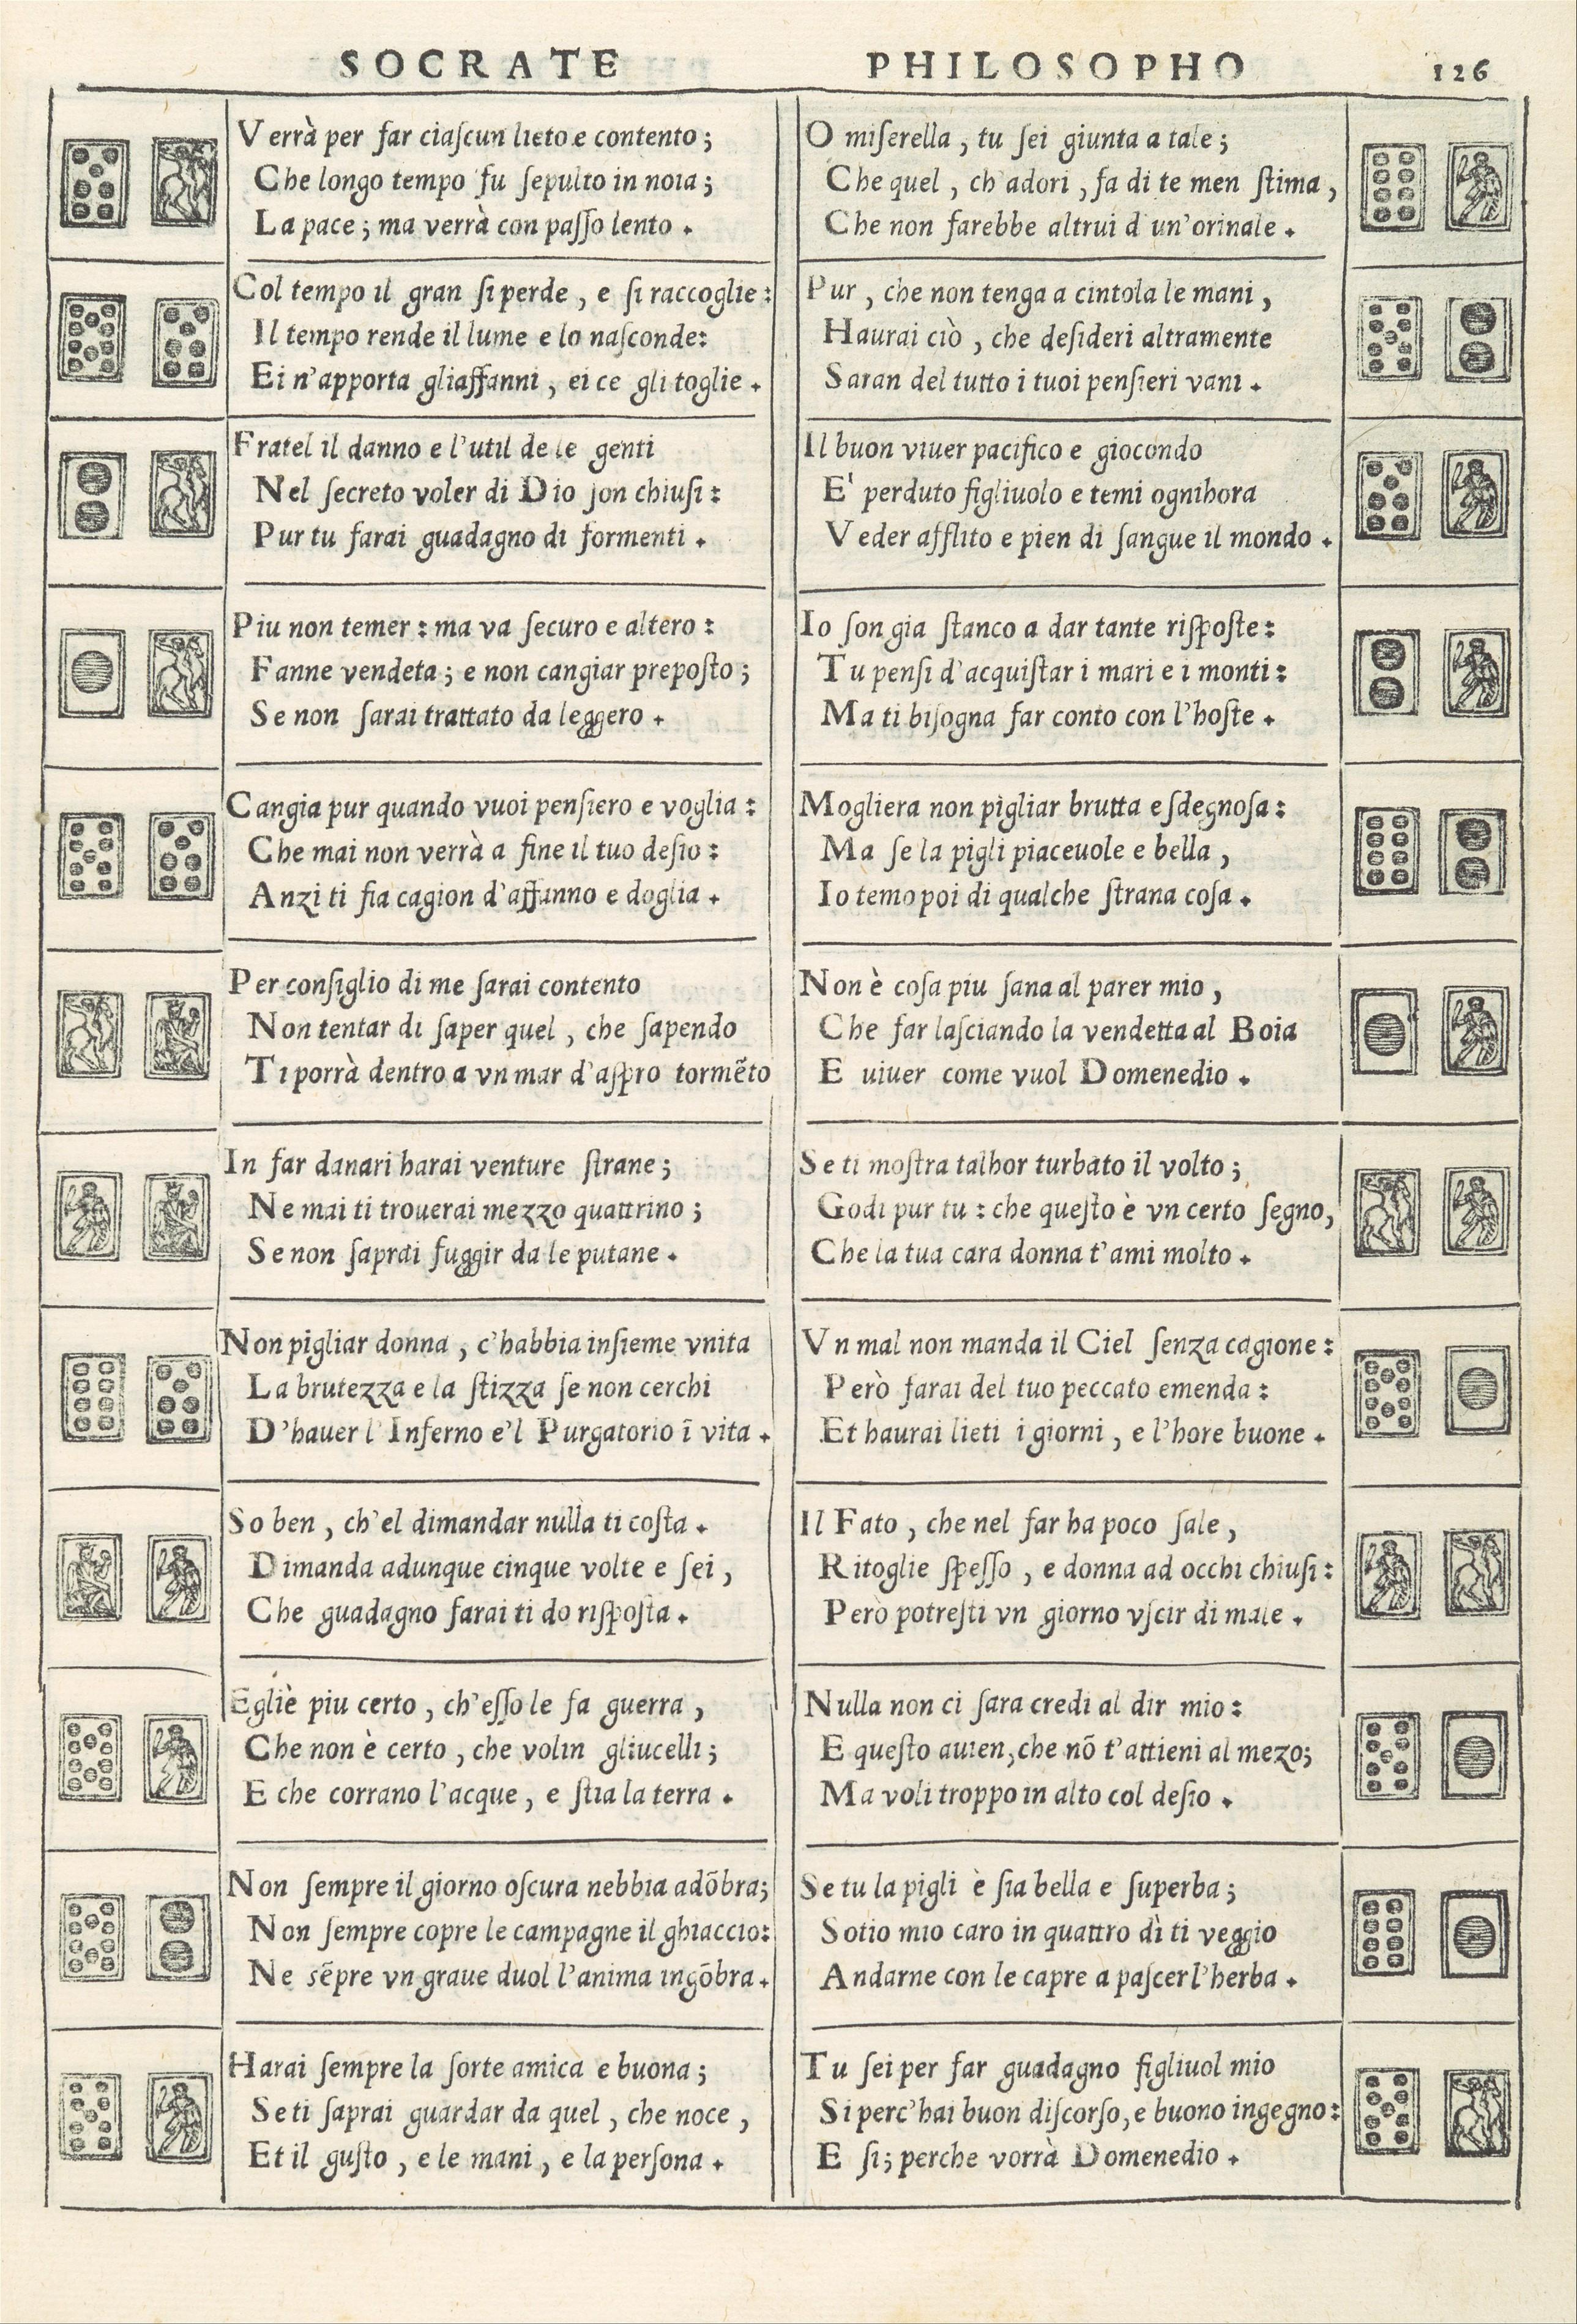 Terra Buona Per Giardino file:le sortiintitolate giardino di pensieri met dp108987